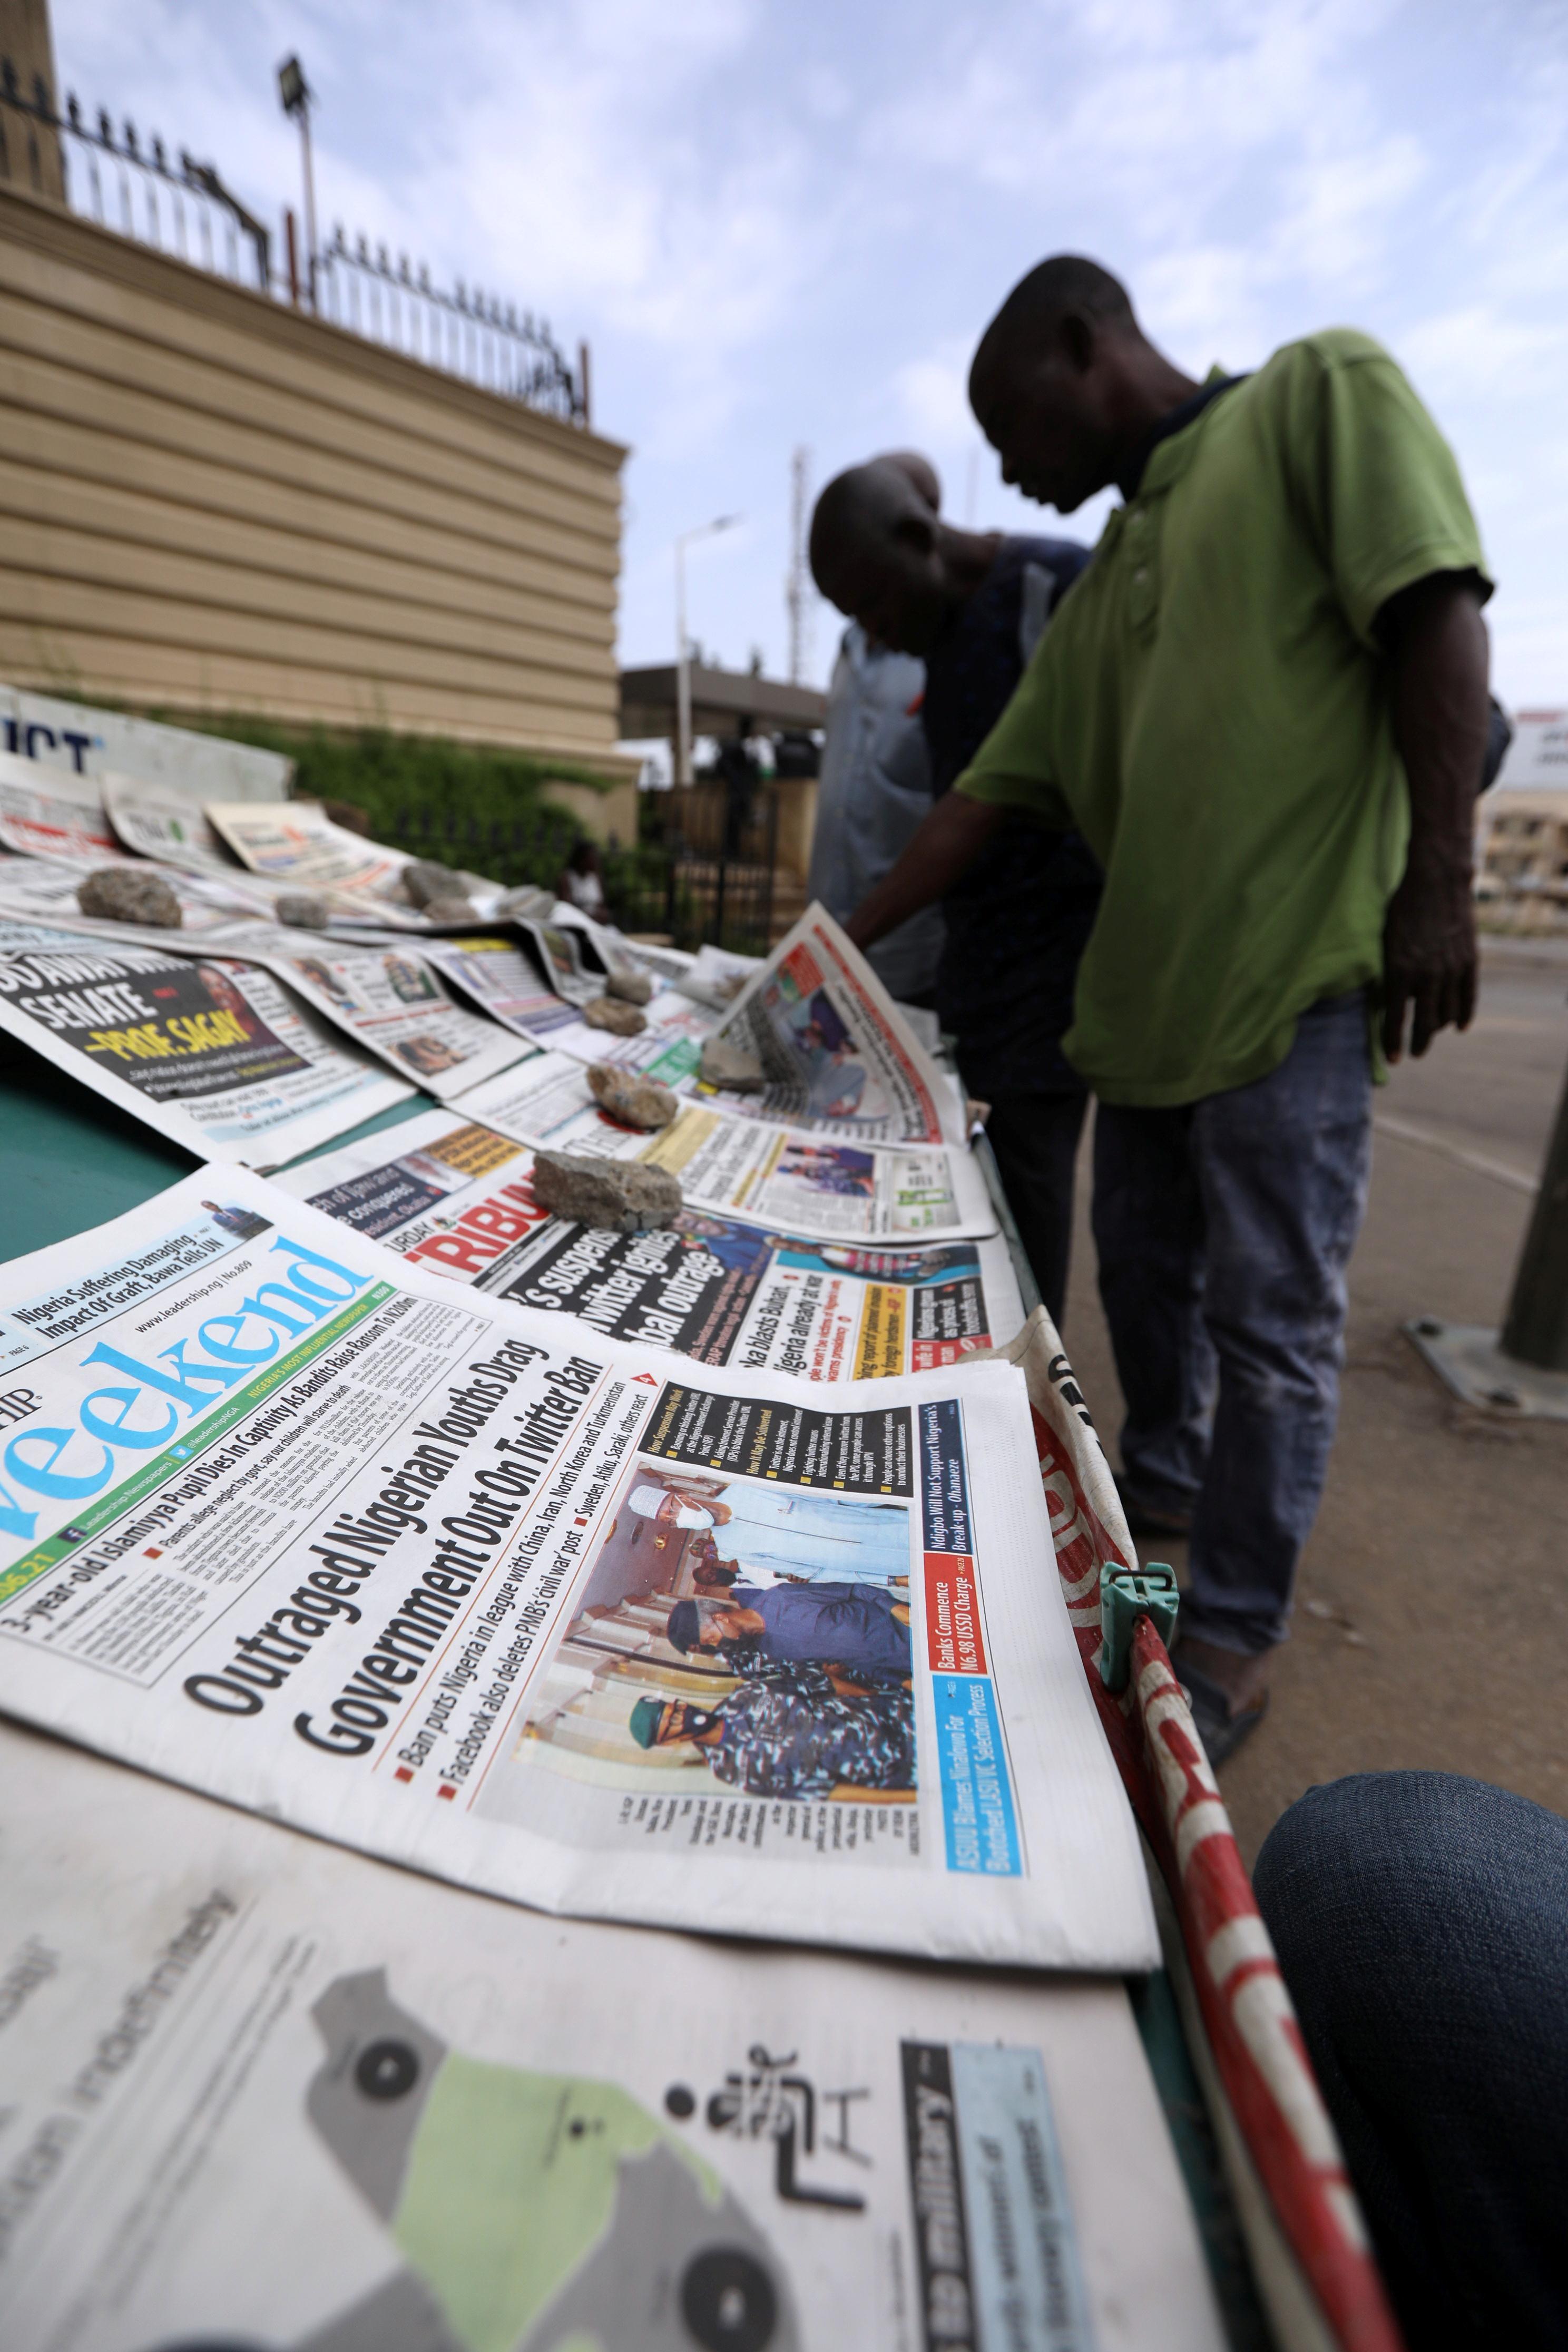 Pedestrians look at newspapers in Abuja, Nigeria June 5, 2021. REUTERS/Afolabi Sotunde